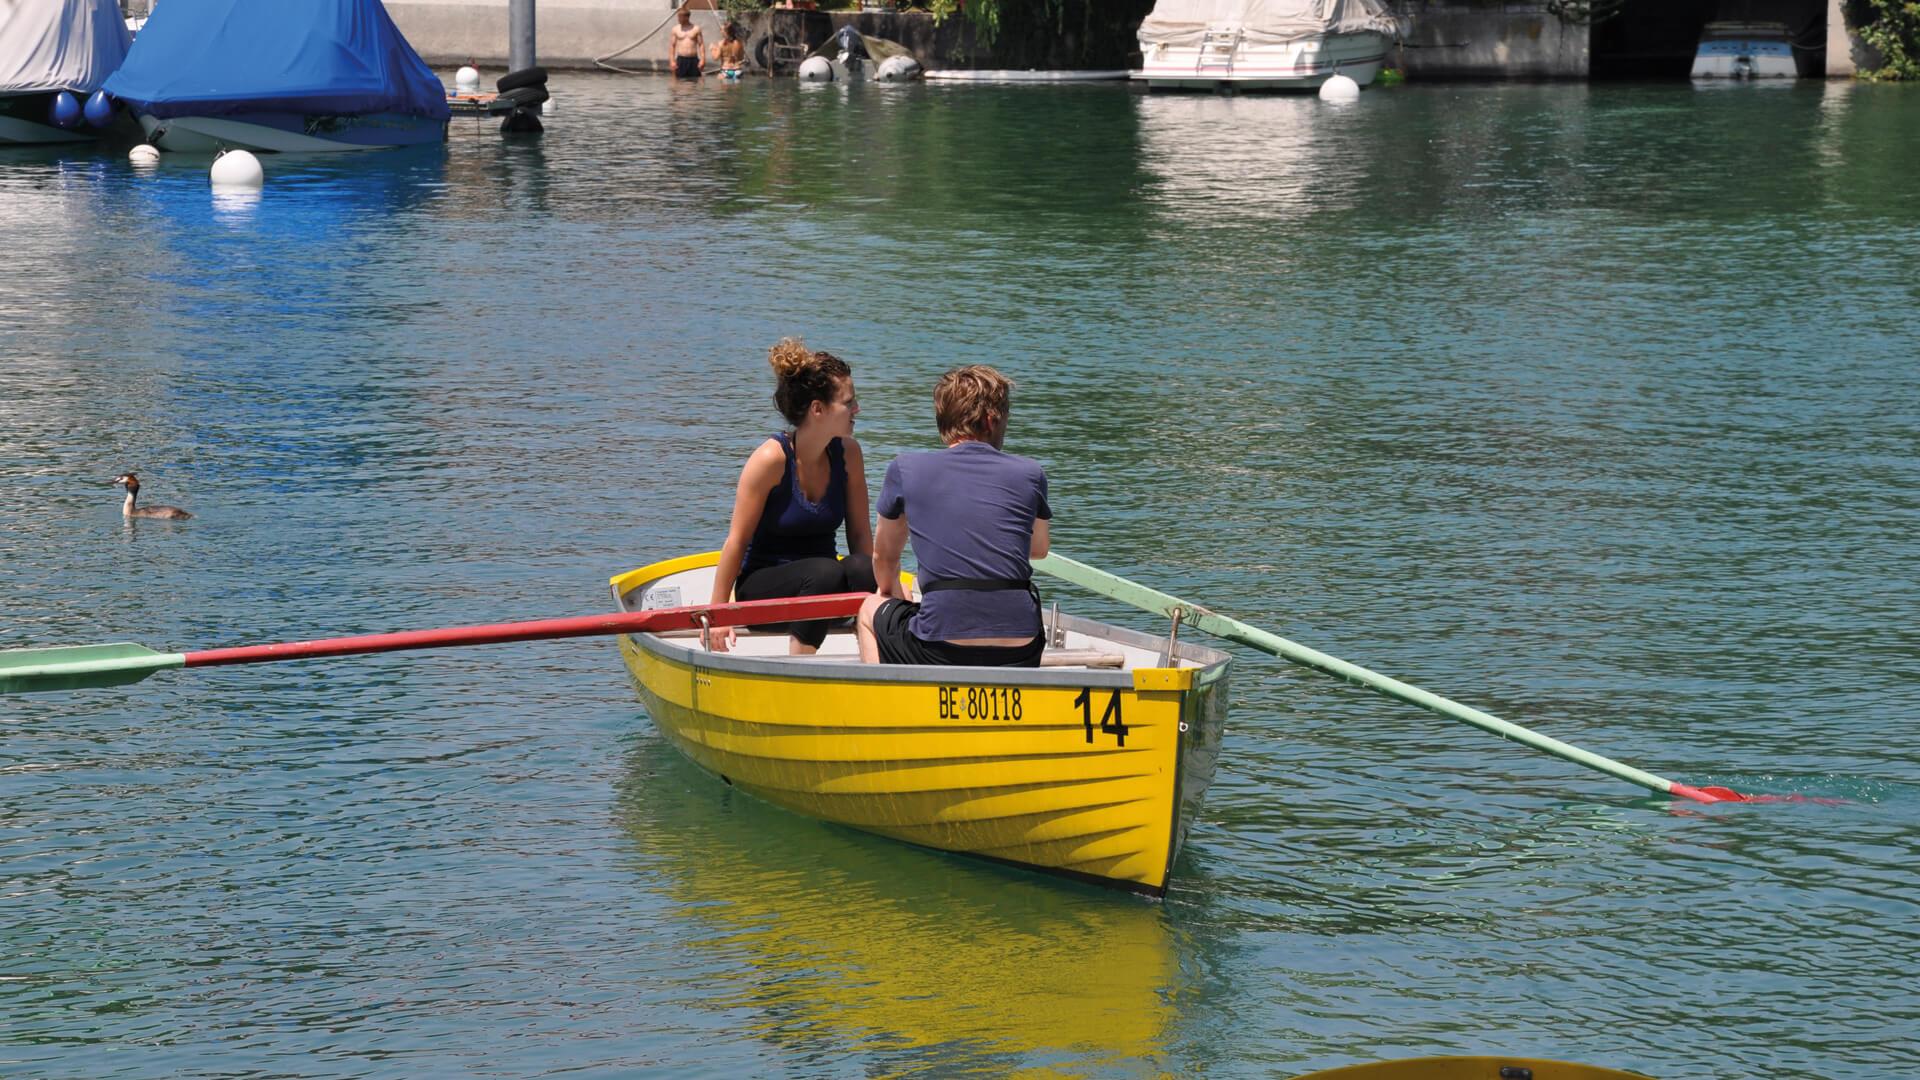 thun-gwatt-tauscheck-ruderboot